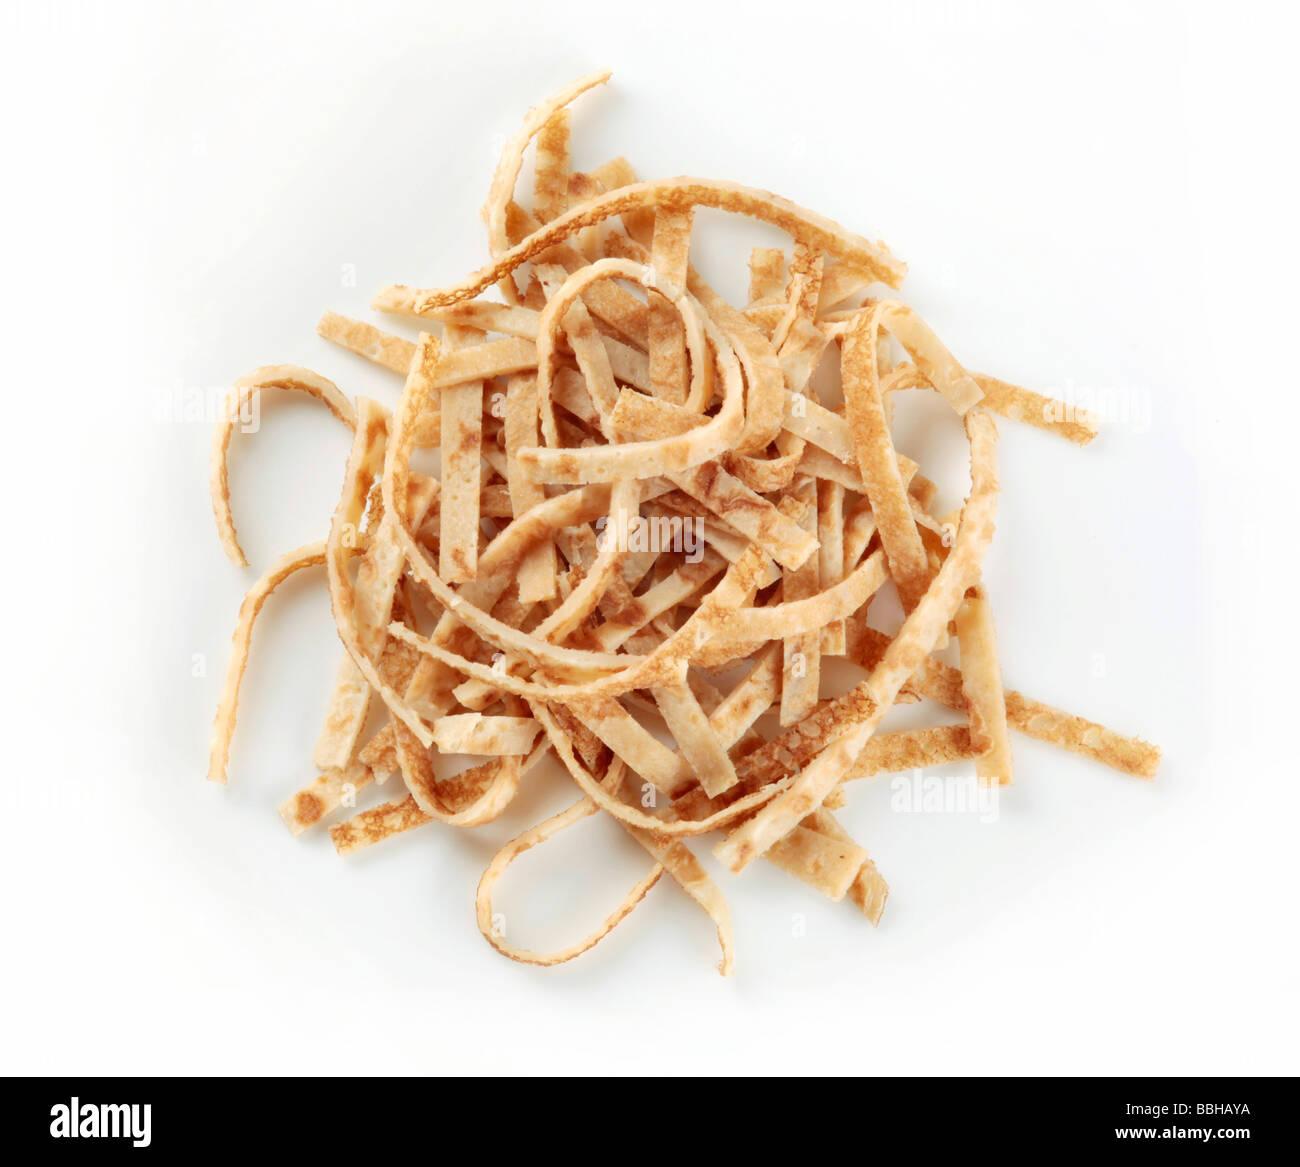 Celestine noodles - sliced pancakes - Stock Image